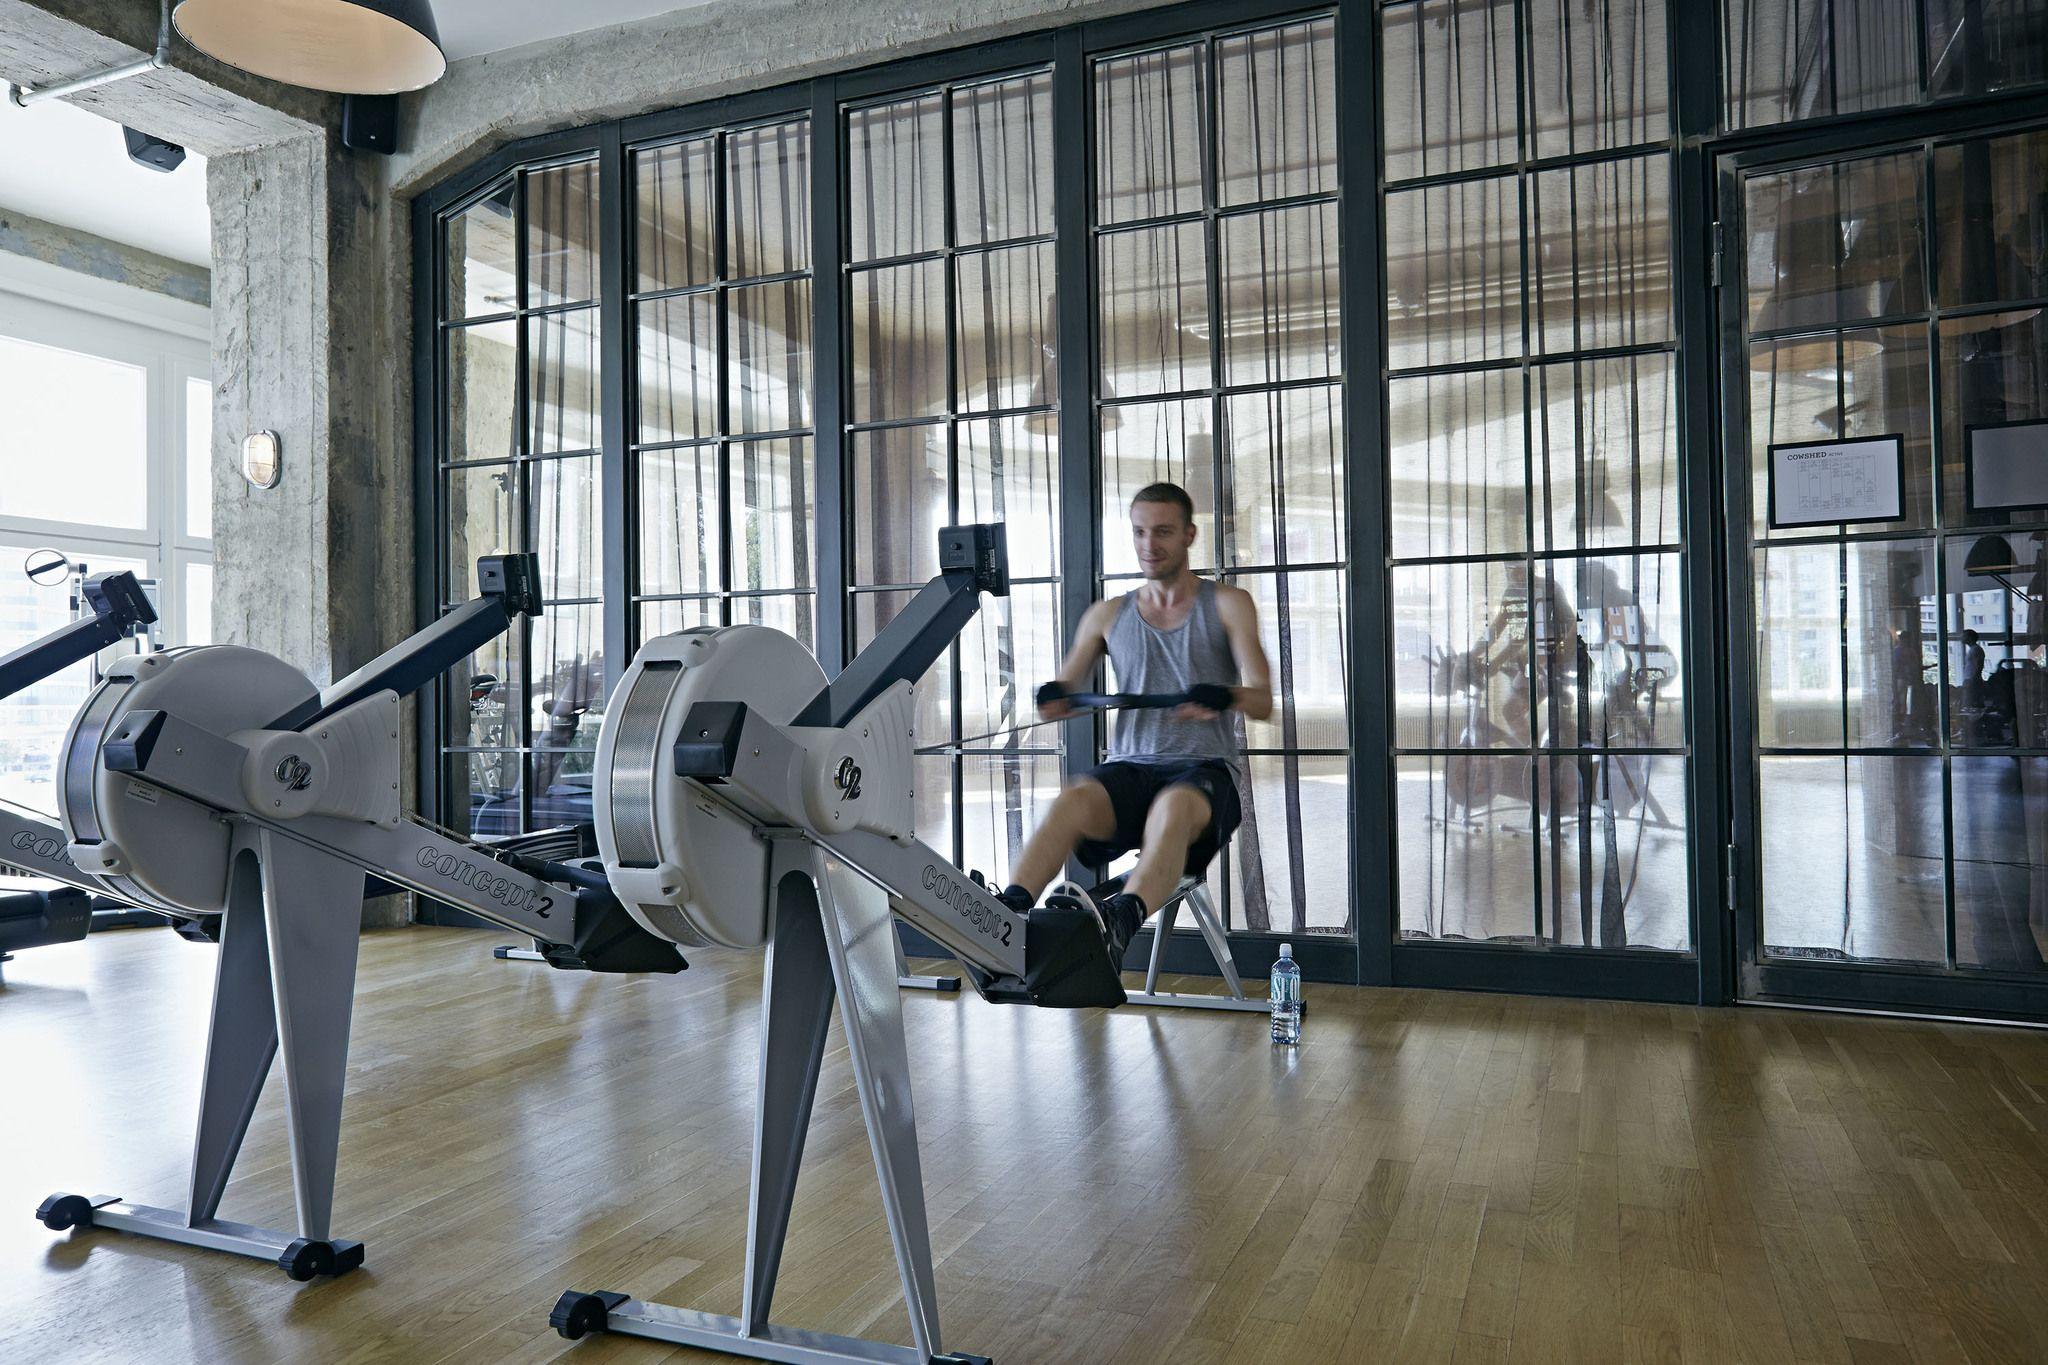 soho house berlin - Google Search | Fitness Center | Pinterest